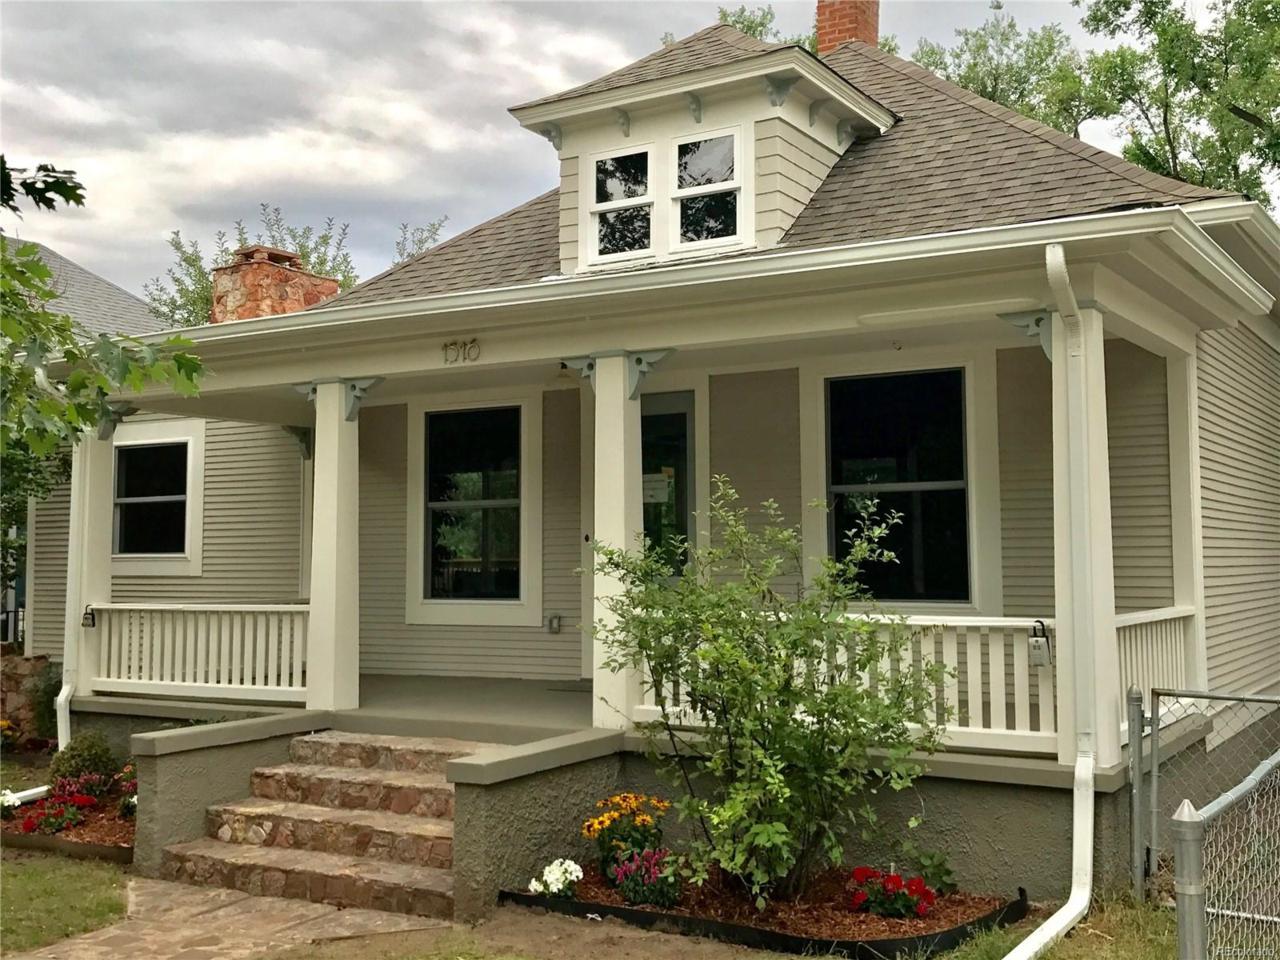 1516 N Corona Street, Colorado Springs, CO 80903 (MLS #7575529) :: 8z Real Estate